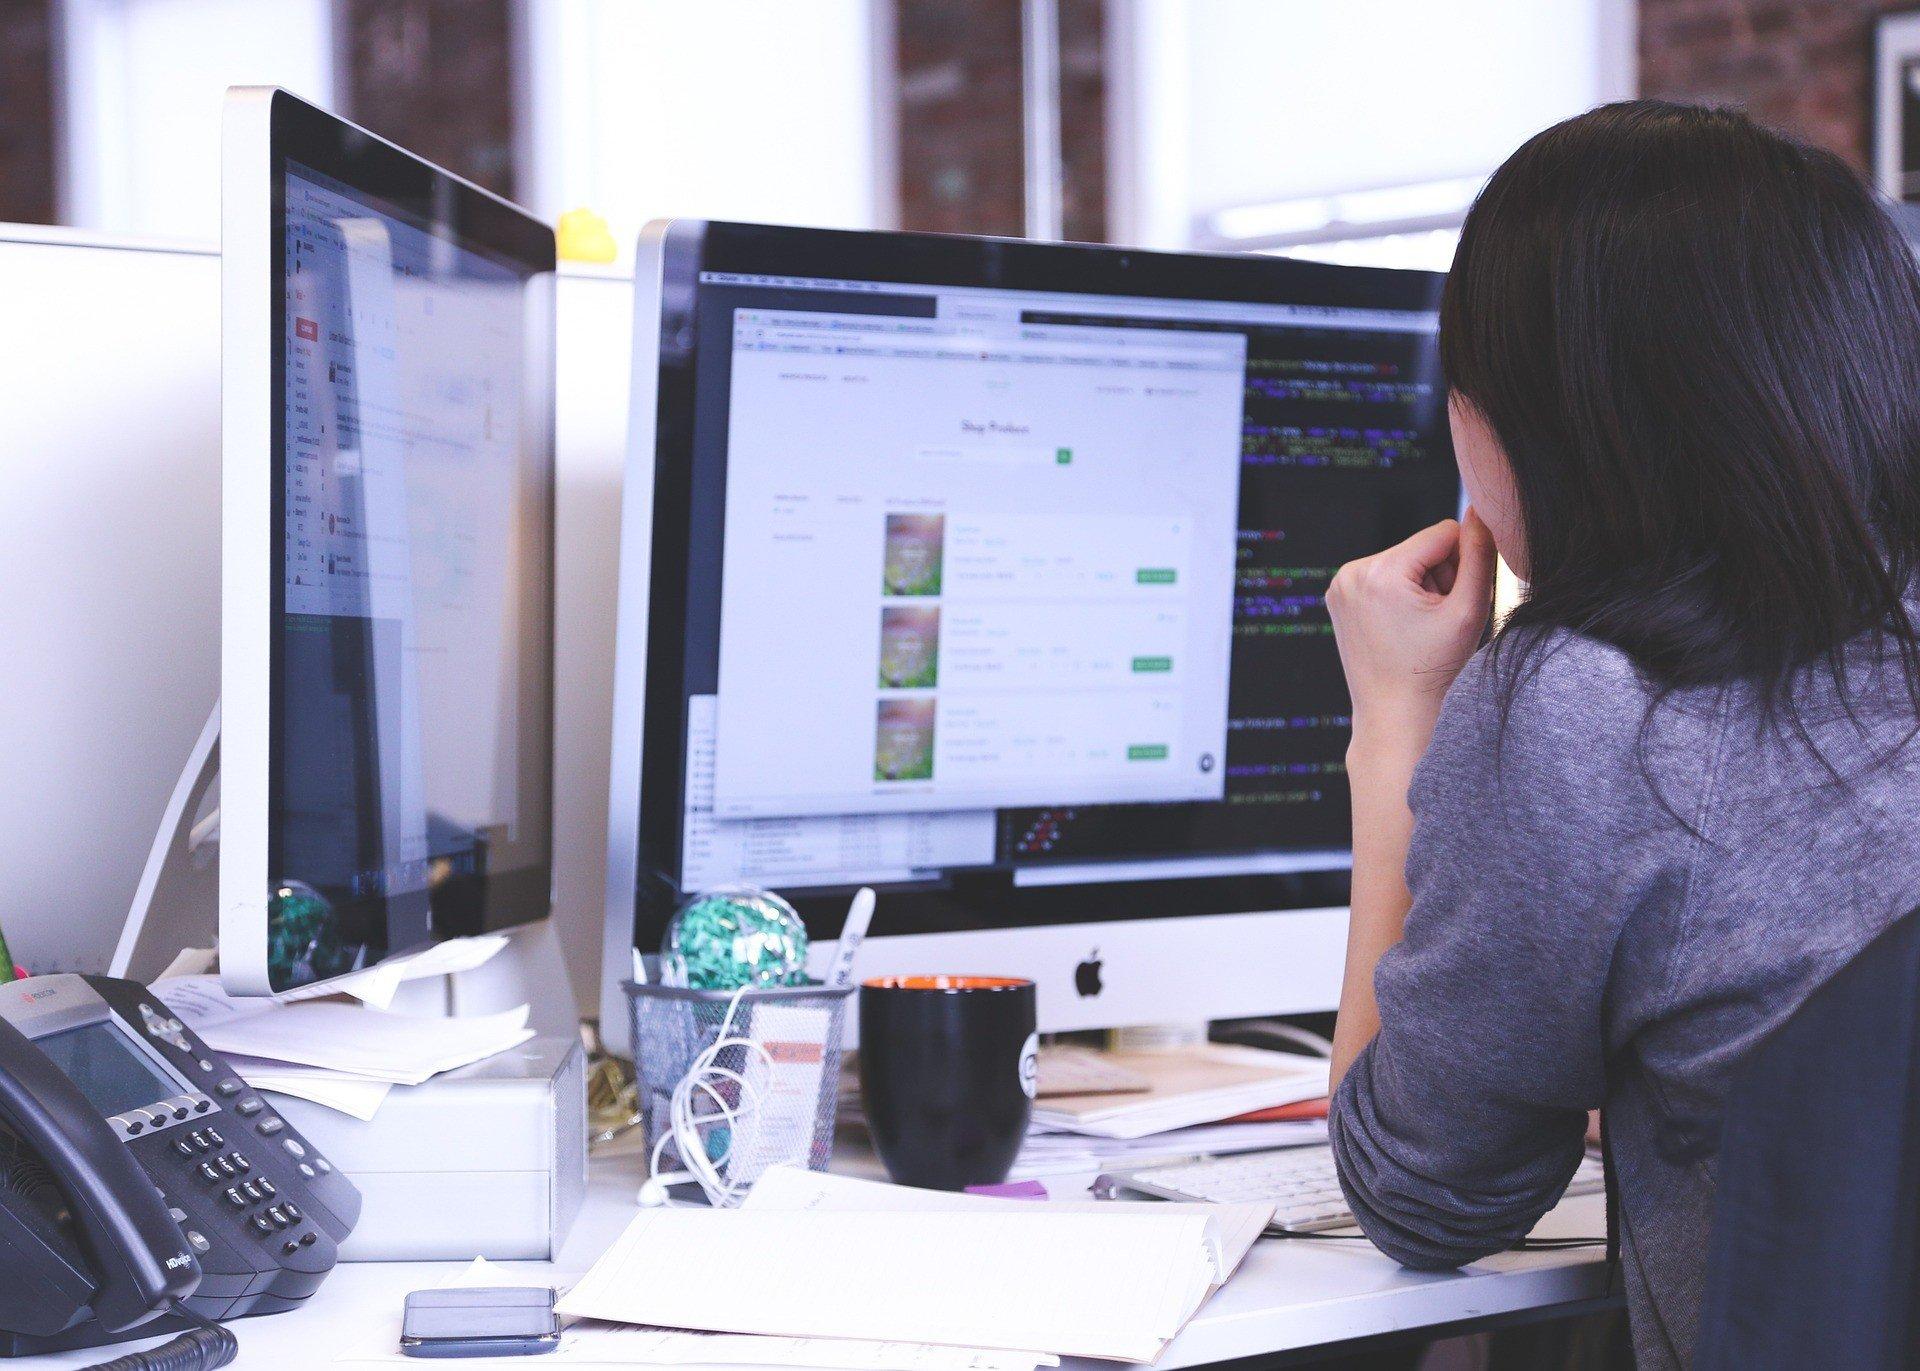 thailand web development outsource